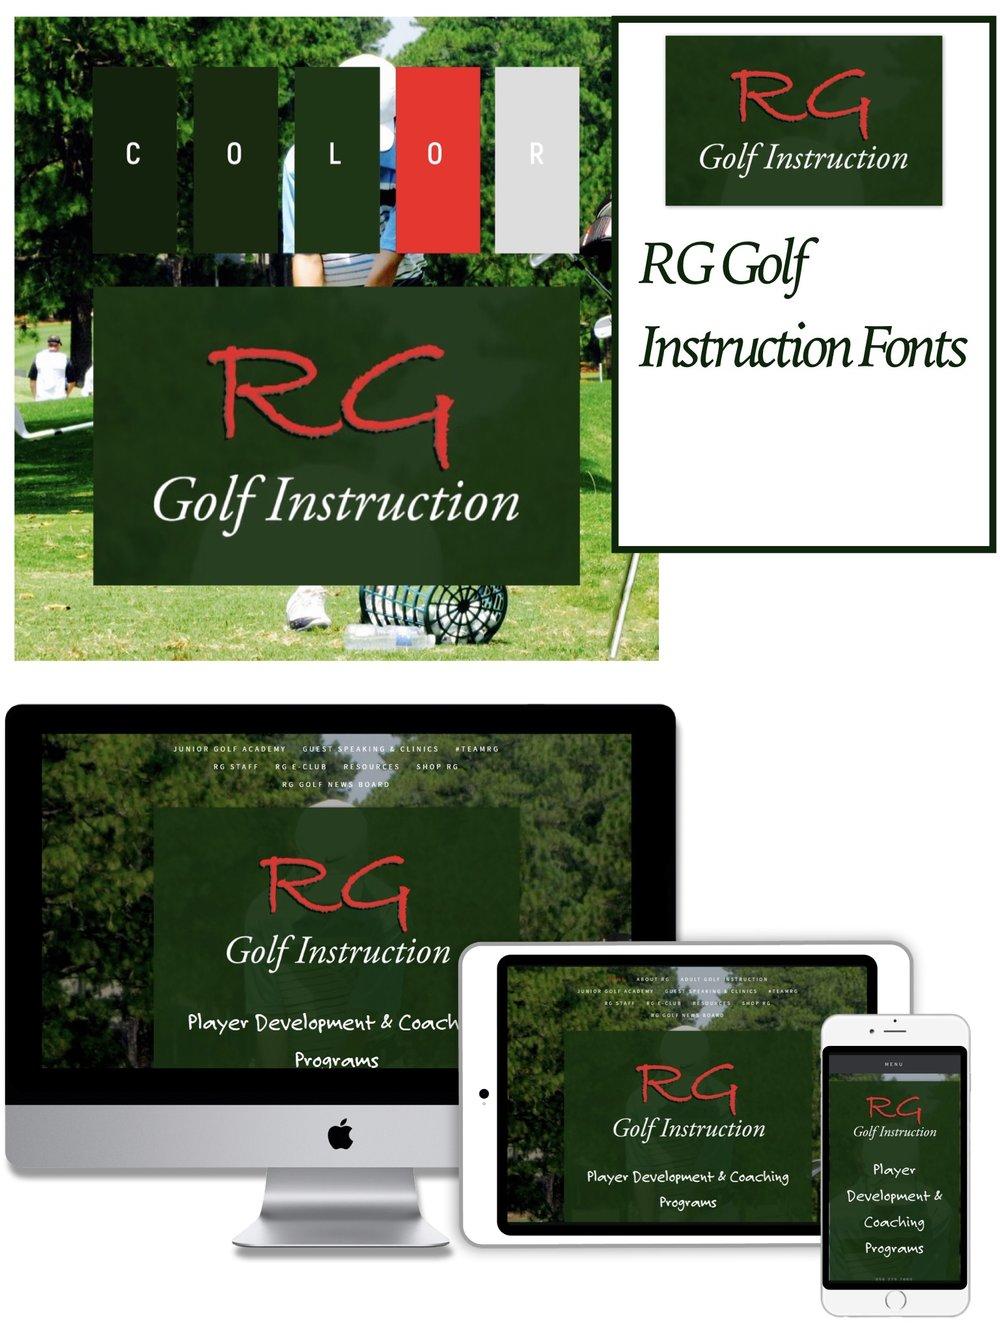 RGGOLFINSTRUCTION.COM